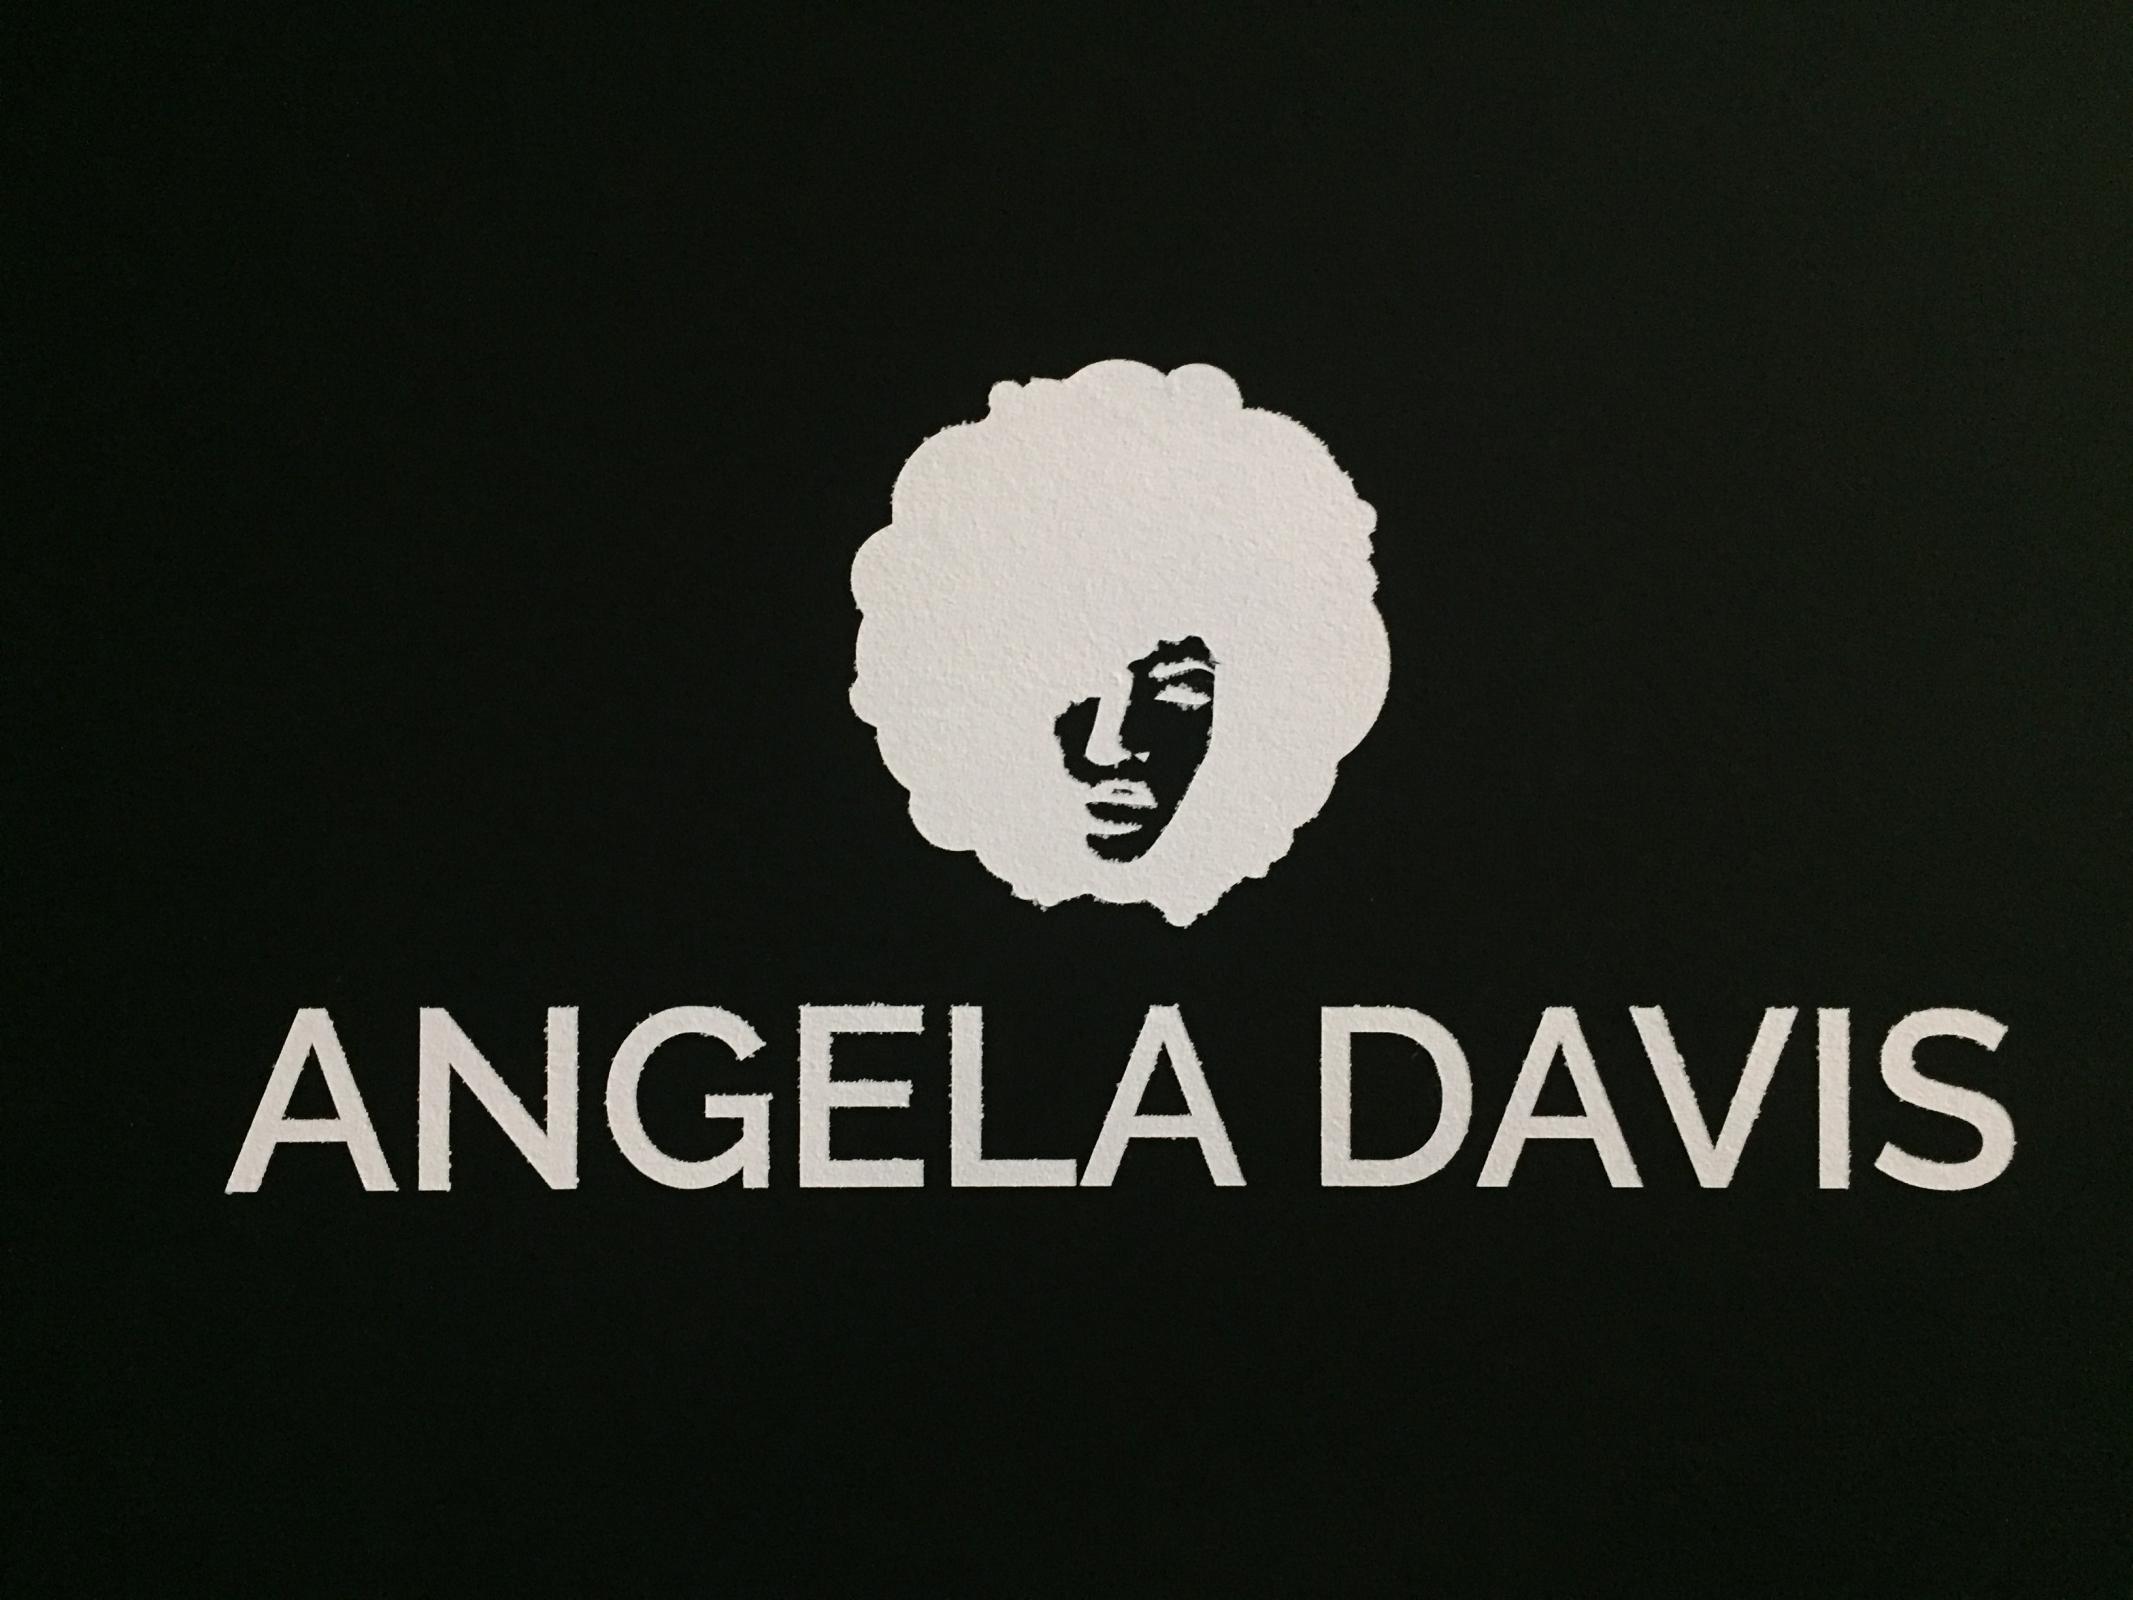 pascal-lievre-nicole-tran-ba-vang-galerie-mouvements-photocall-angela-davis